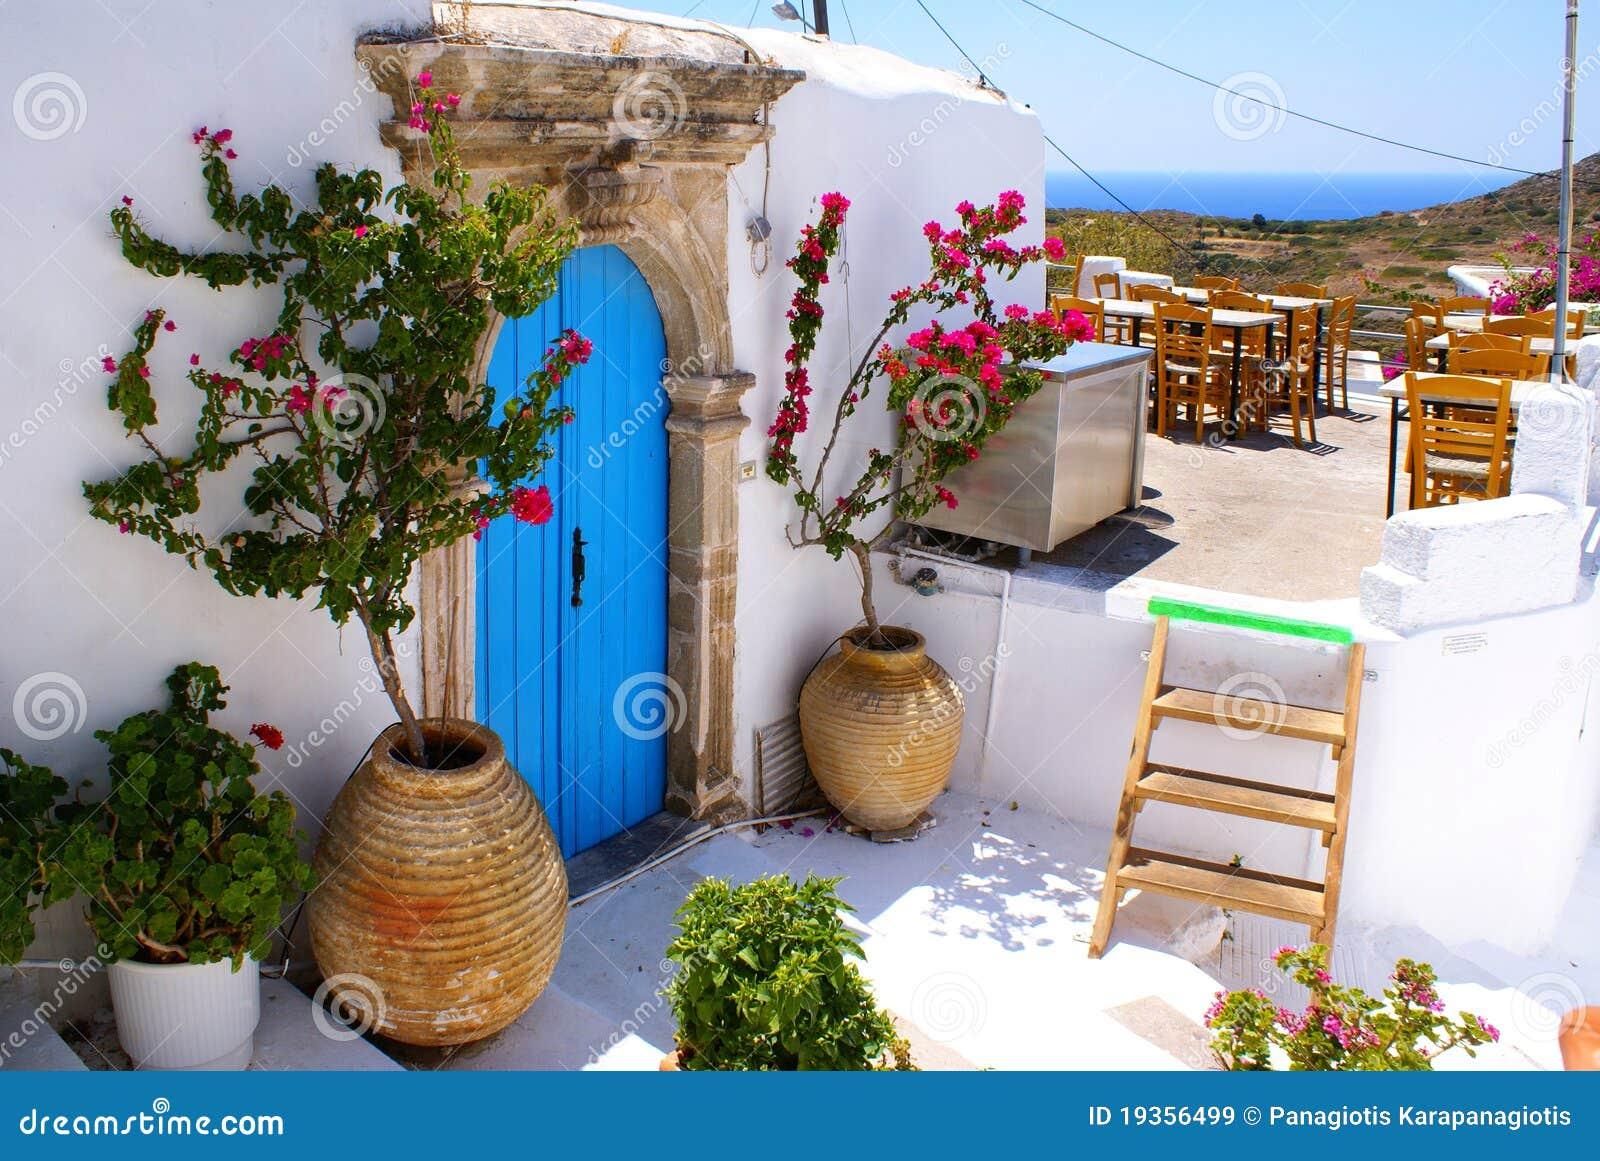 Casa tradicional grega em Kithira